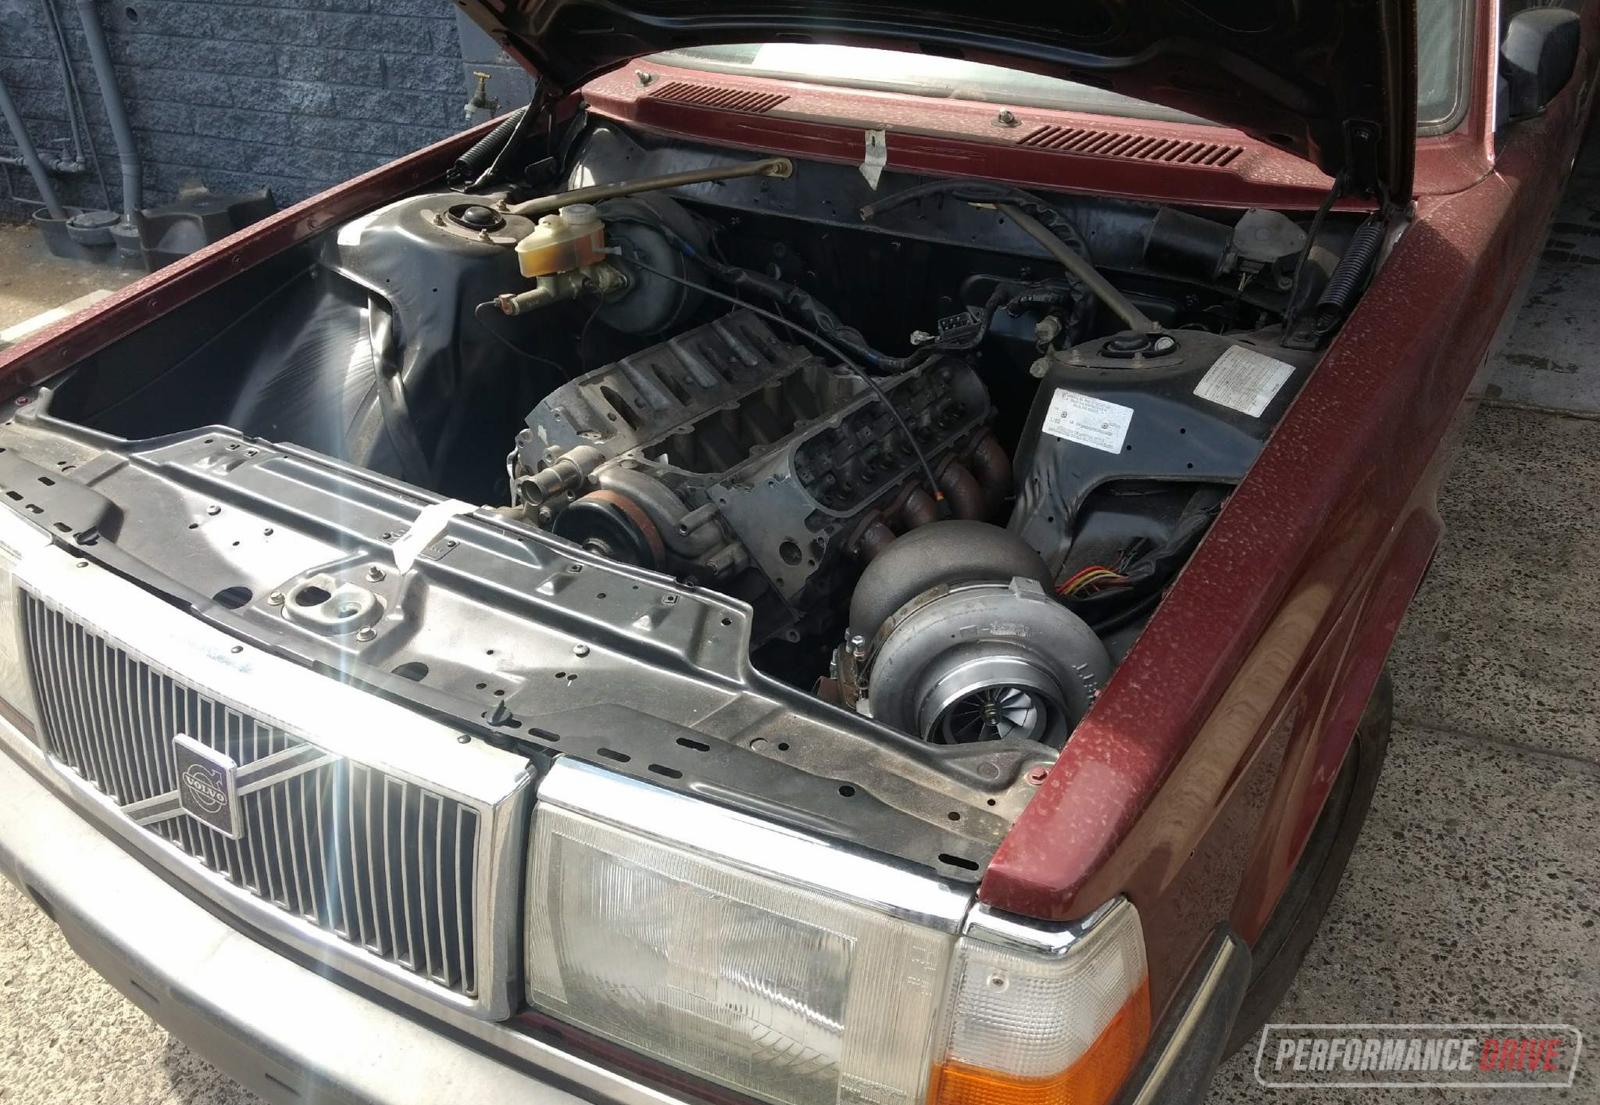 Volvo 240 GL LS1 V8 conversion project: Part 14 – final